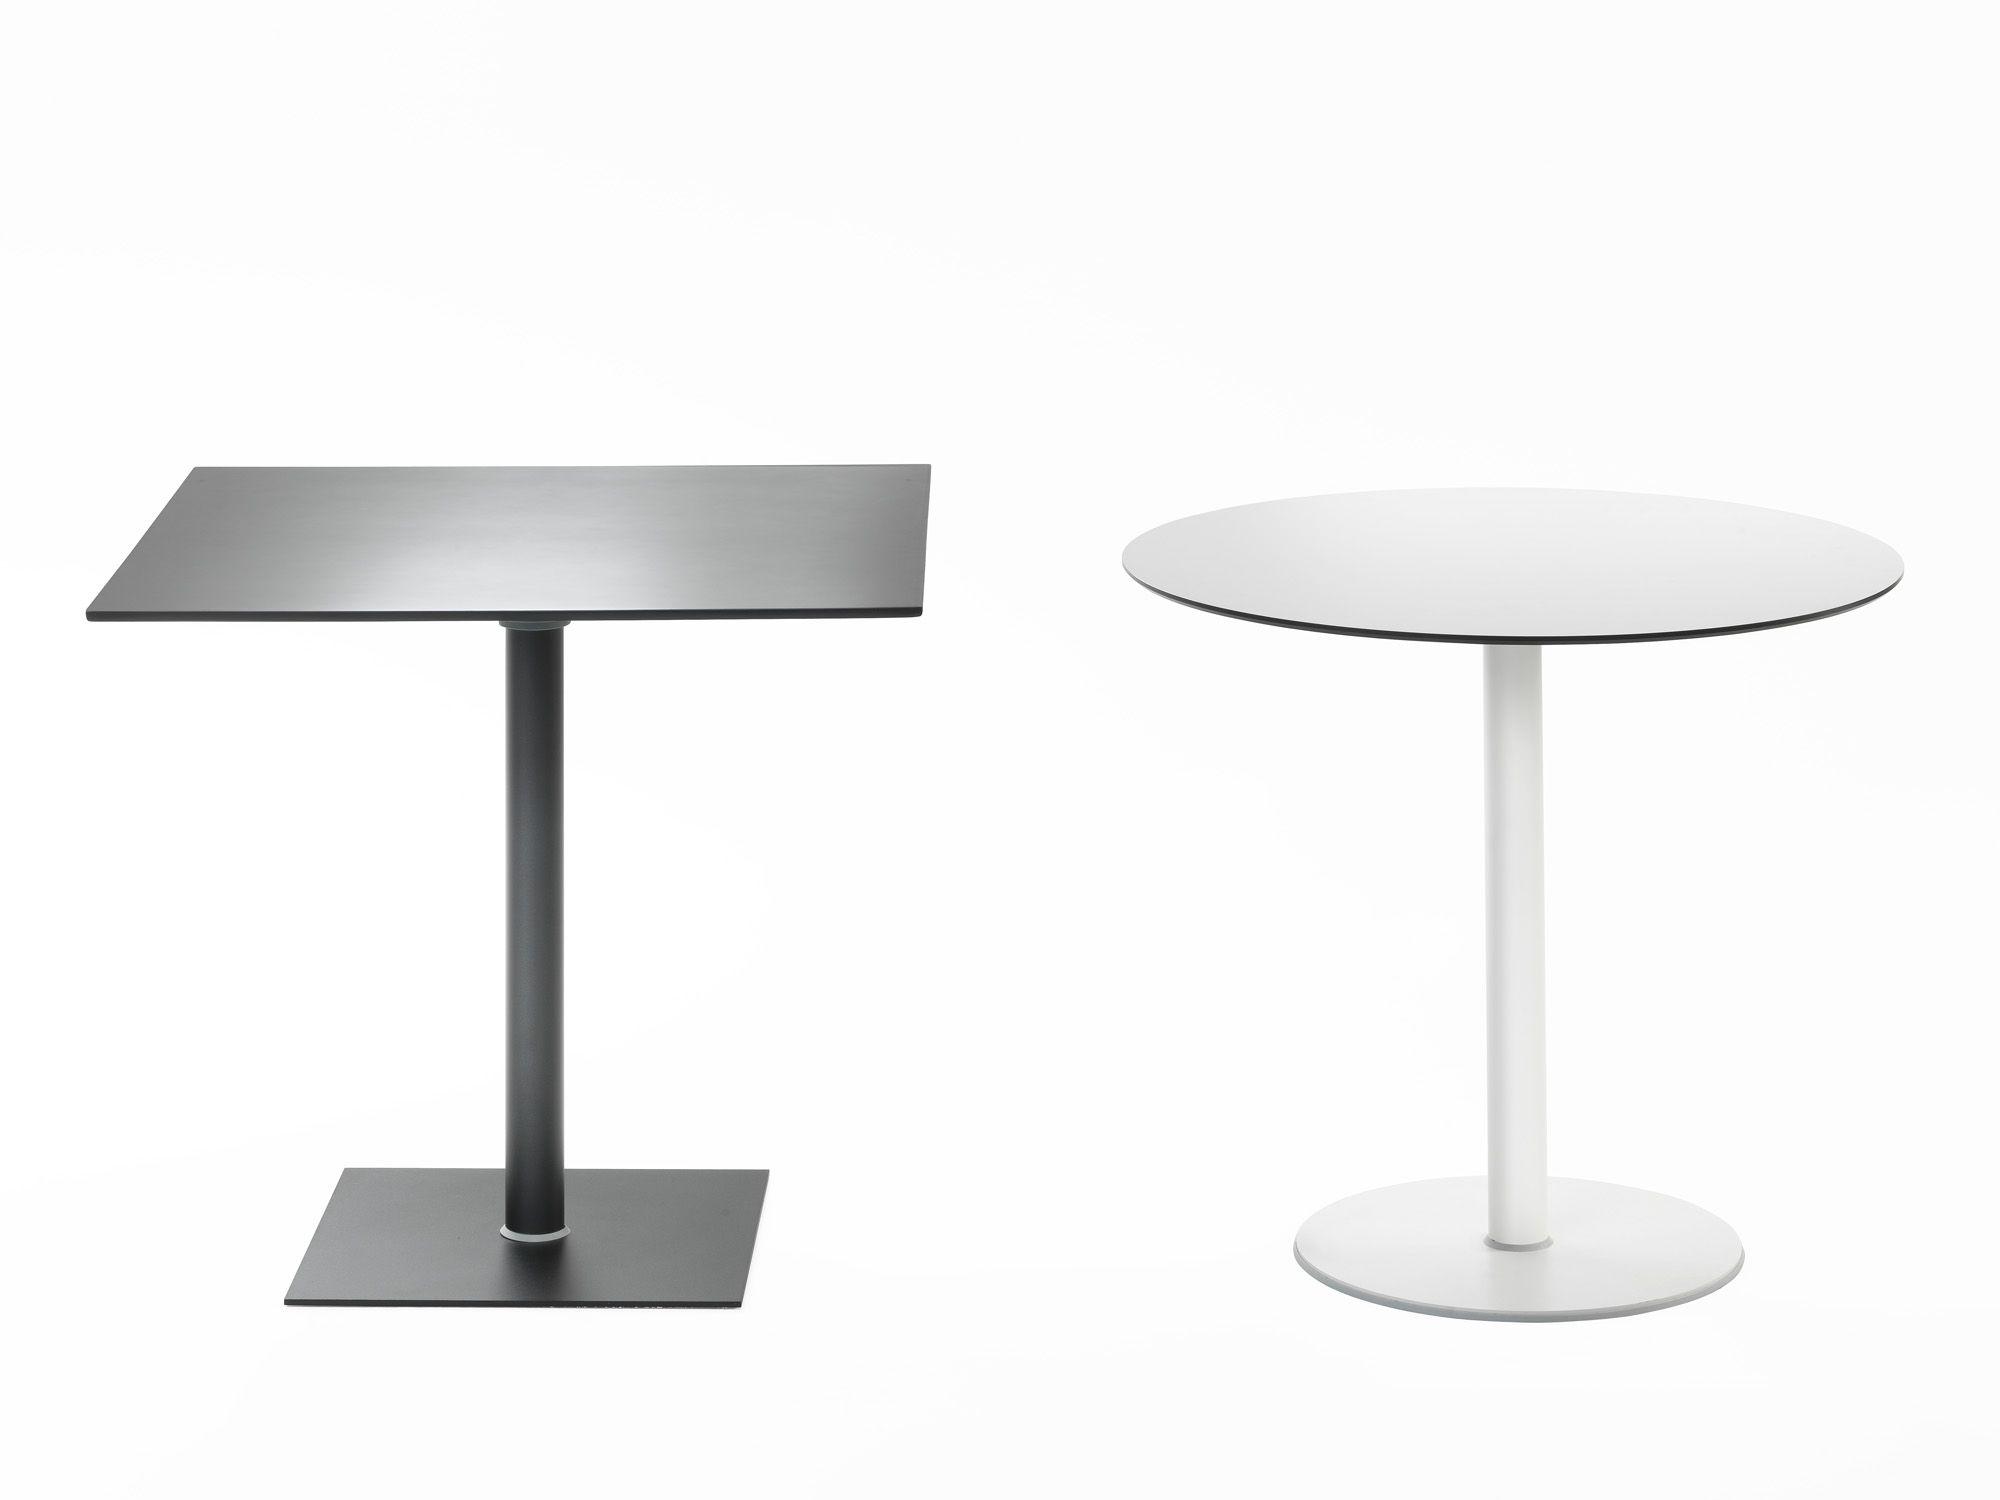 Segis Sedie ~ Segis #boom table segis design team. square or round tables as